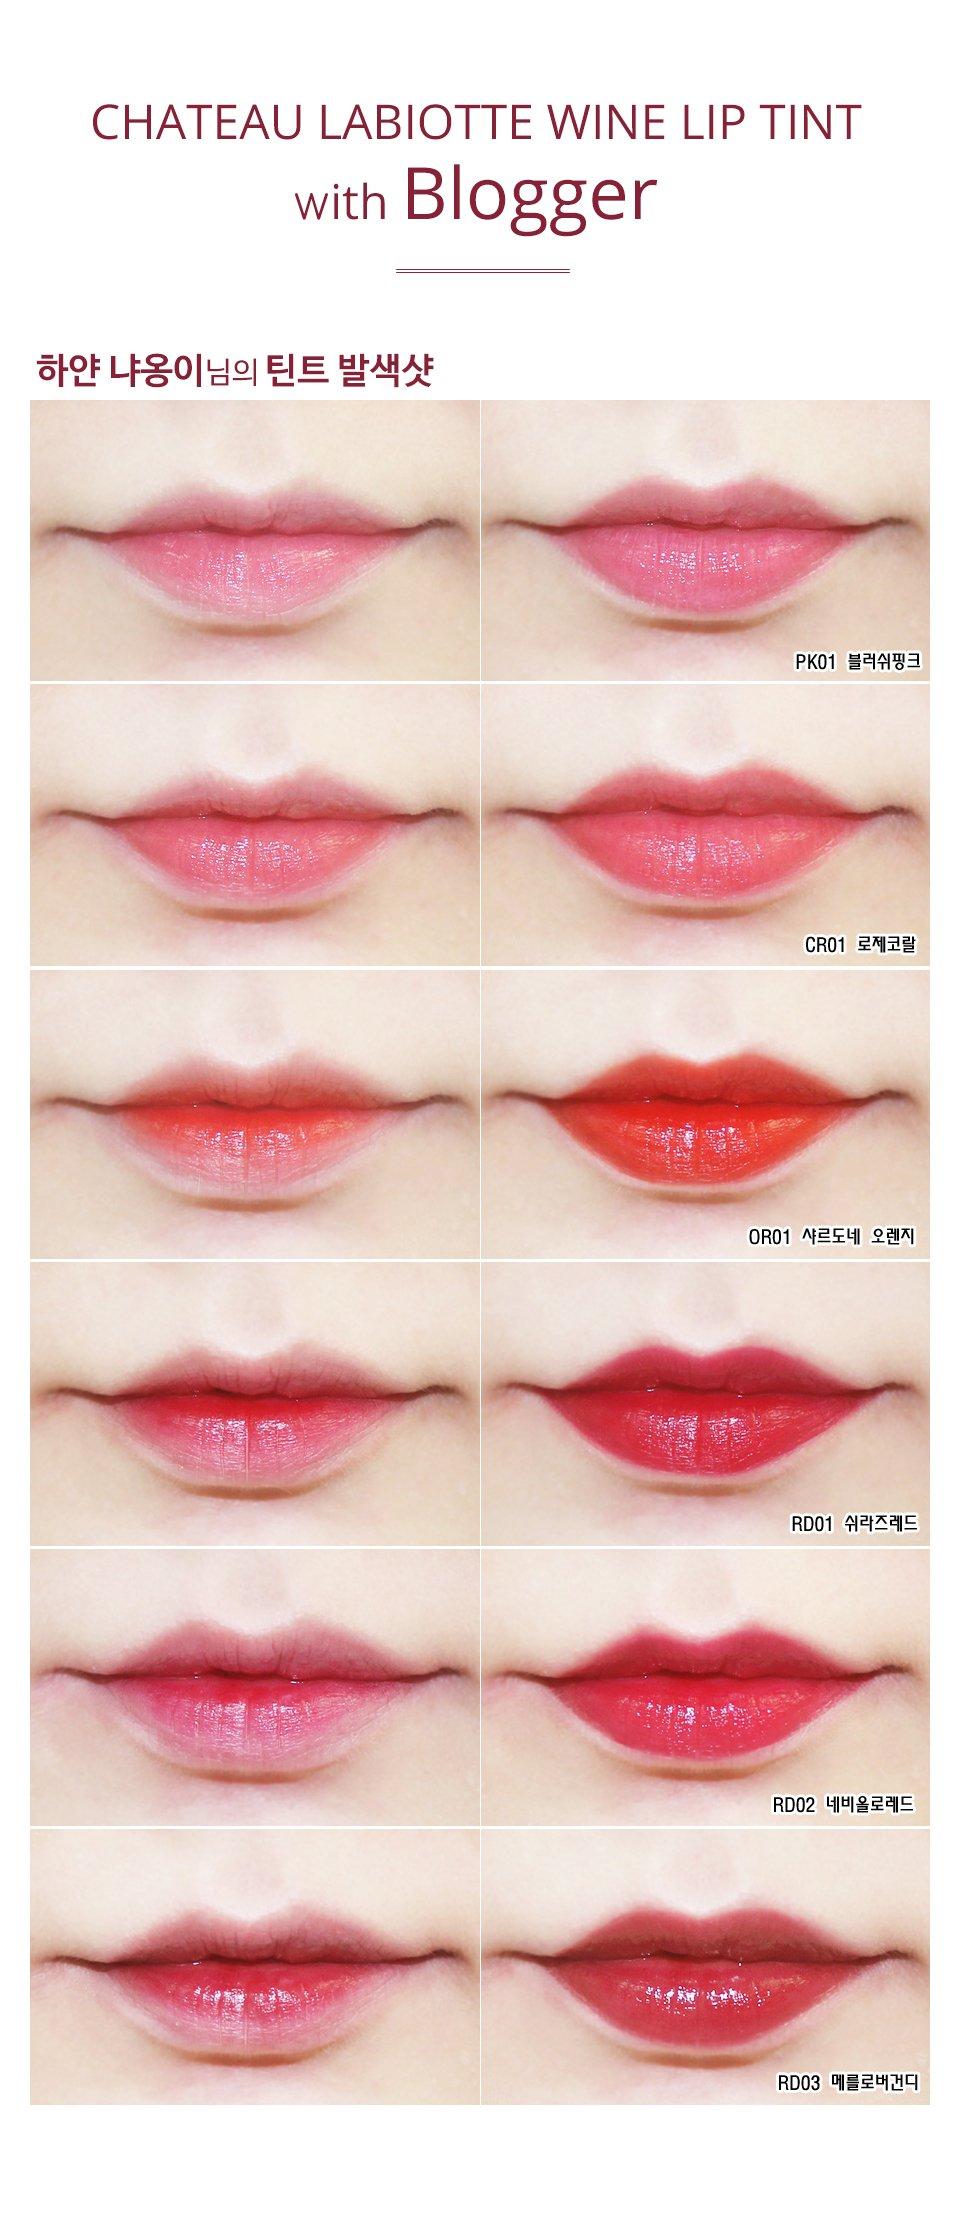 [LABIOTTE] Wine Lip Tint CR01+PK01 (Rose Coral+Blush Pink) 7g 2 pcs Set